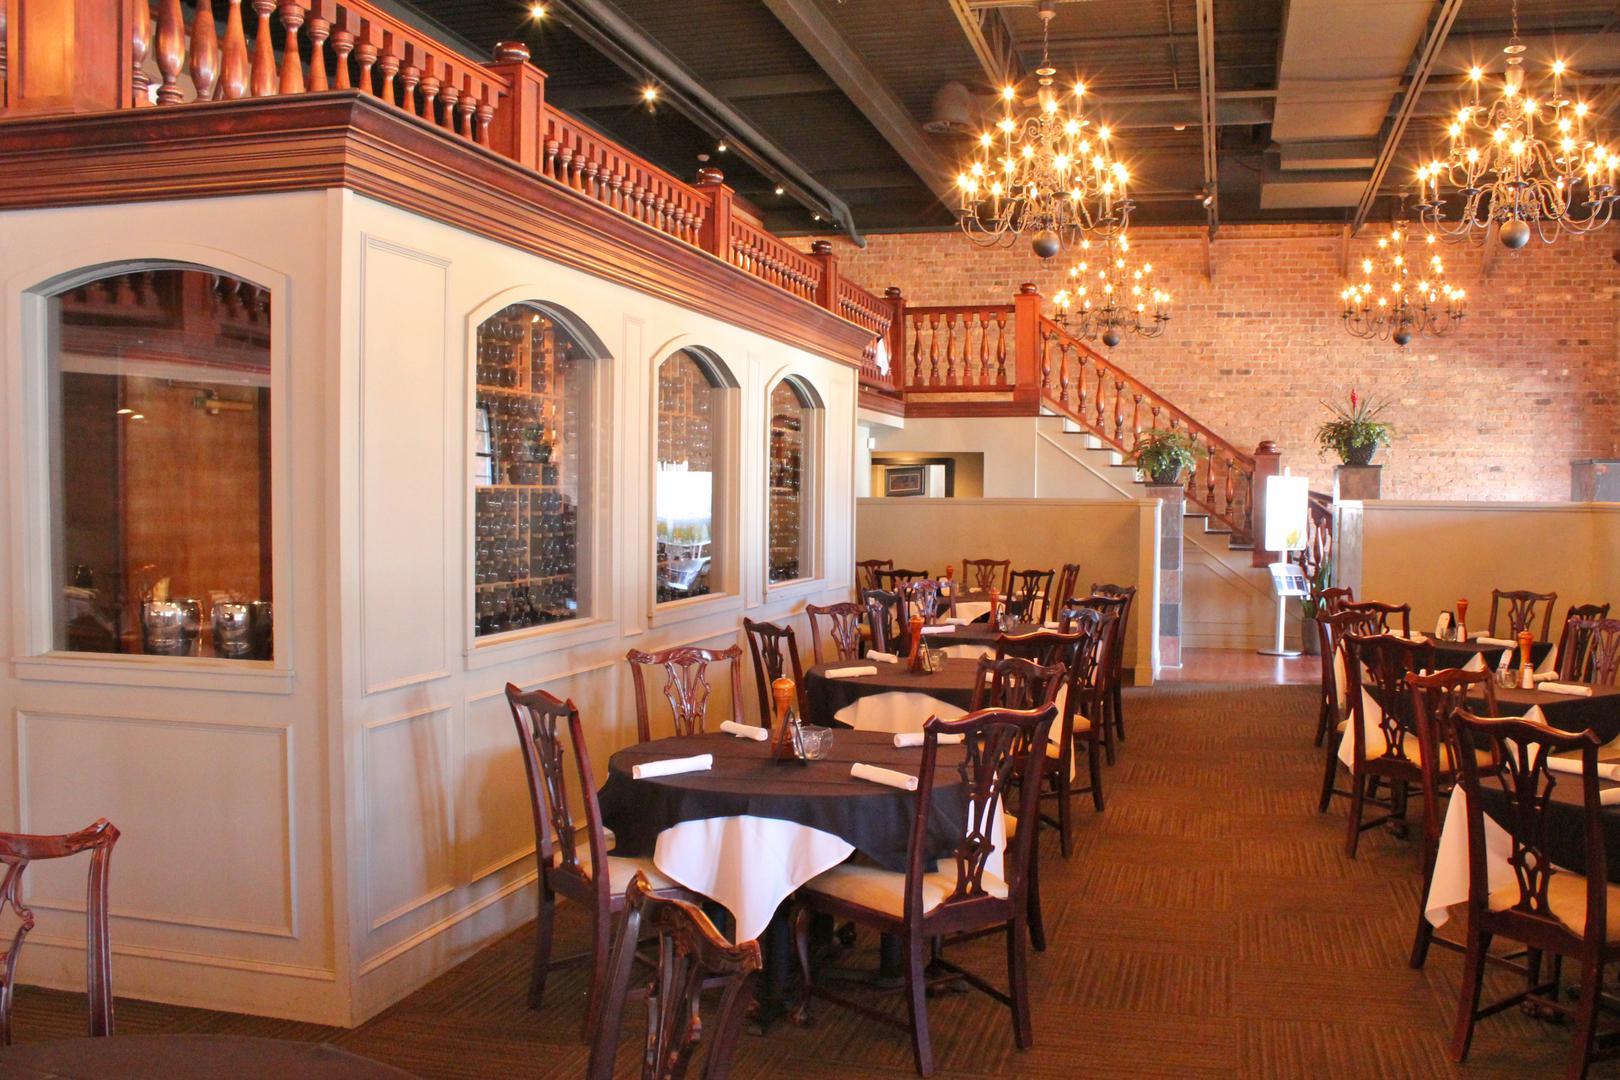 Image Courtesy: Alton's Restaurant